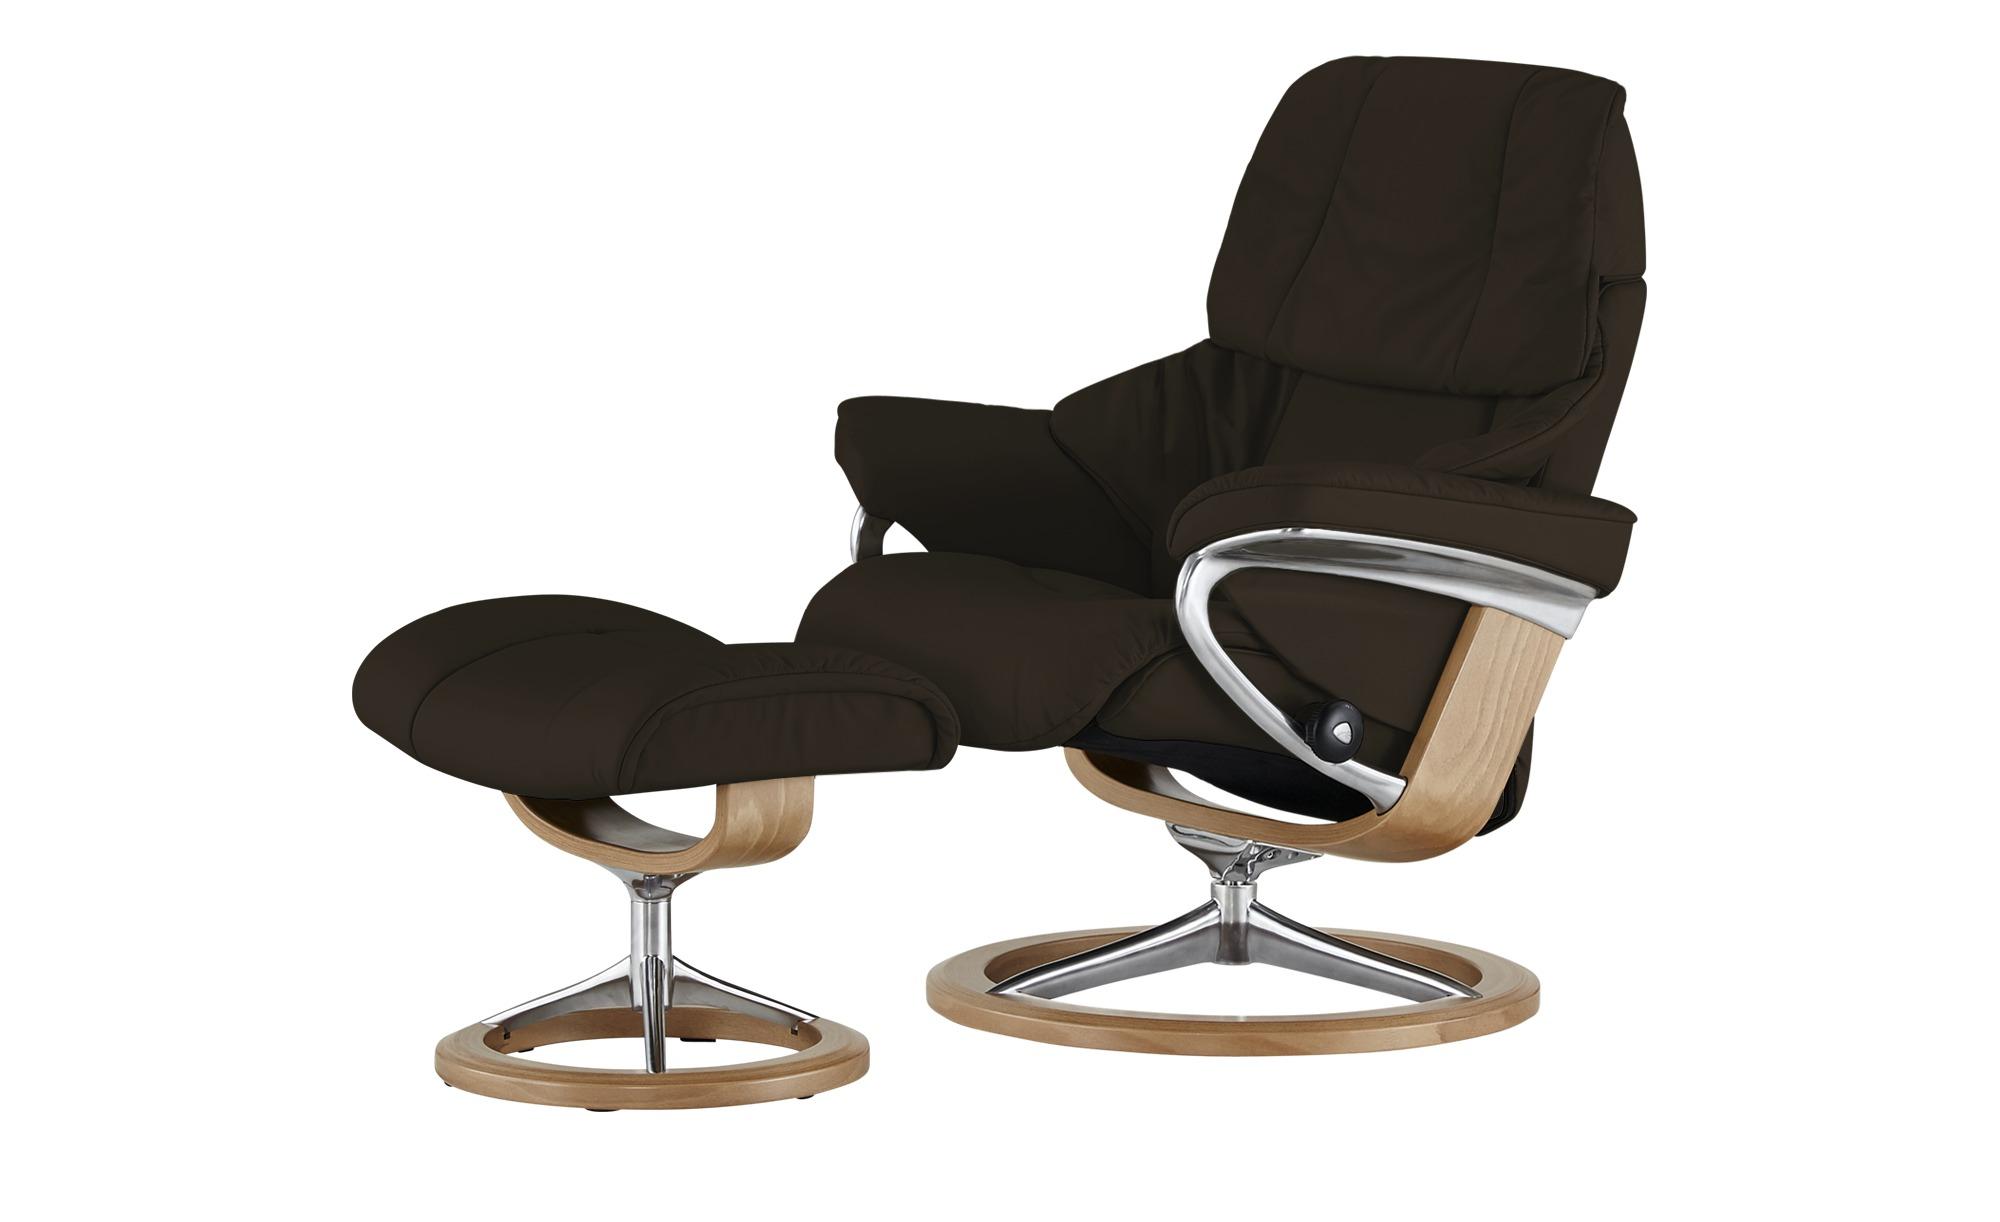 Stressless Relaxsessel mit Hocker braun - Leder Reno M ¦ braun ¦ Maße (cm): B: 83 H: 110 T: 76 Polstermöbel > Sessel > Fernsehsessel - Höffner